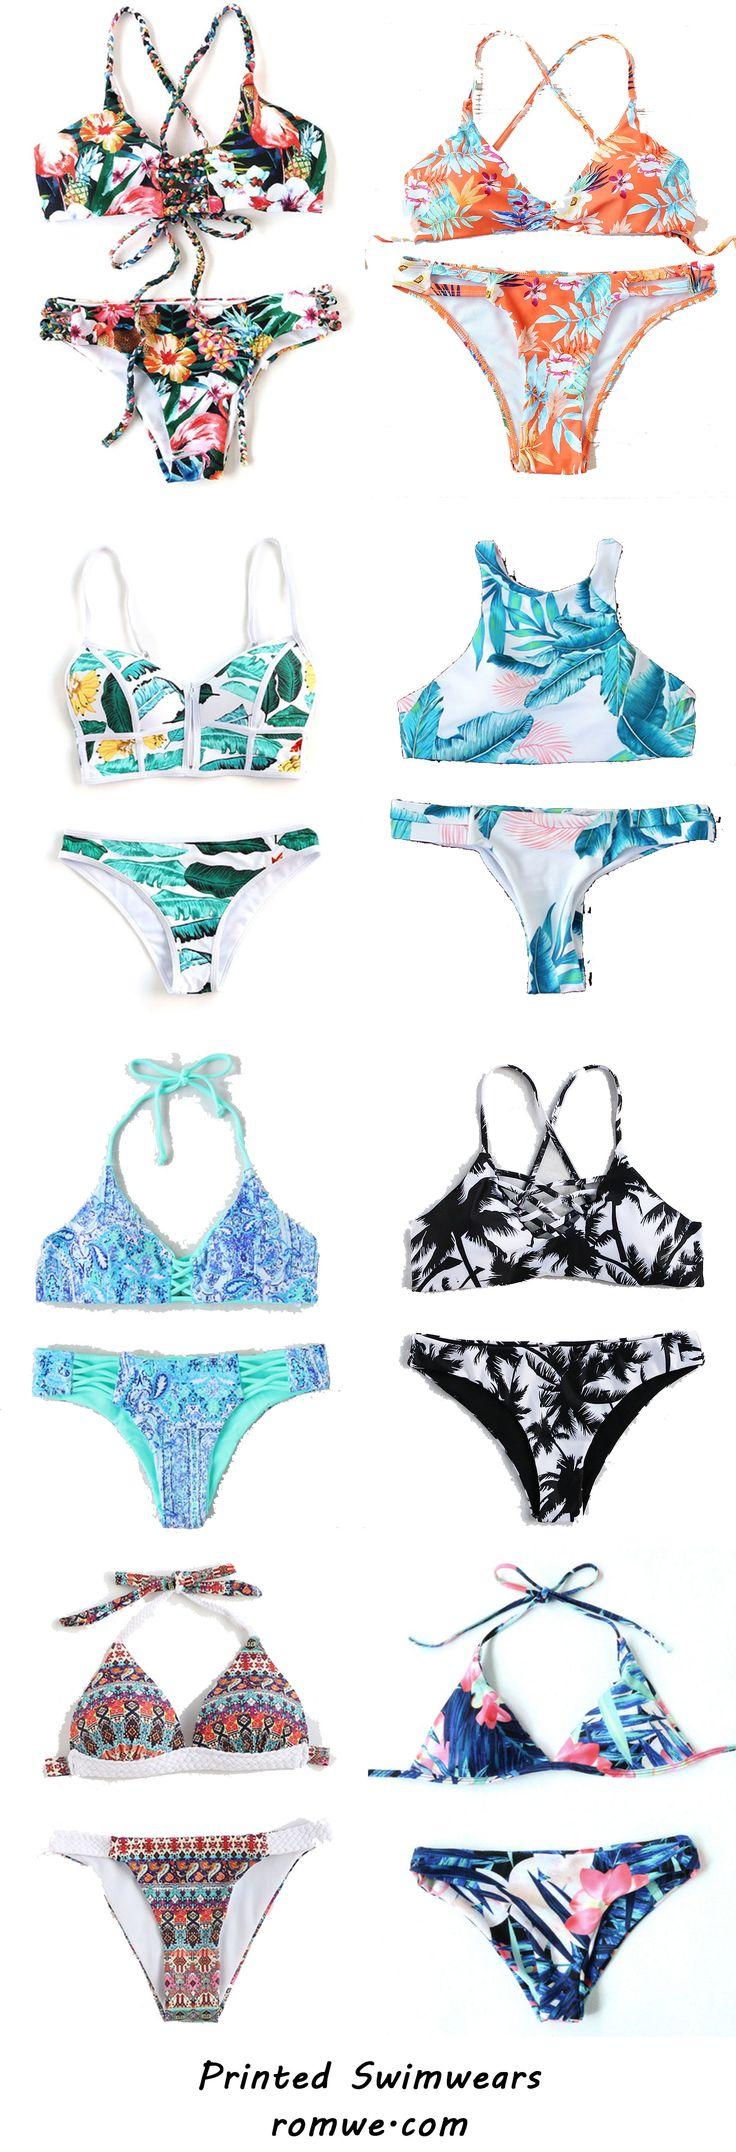 Vintage Printed Swimwears from romwe.com